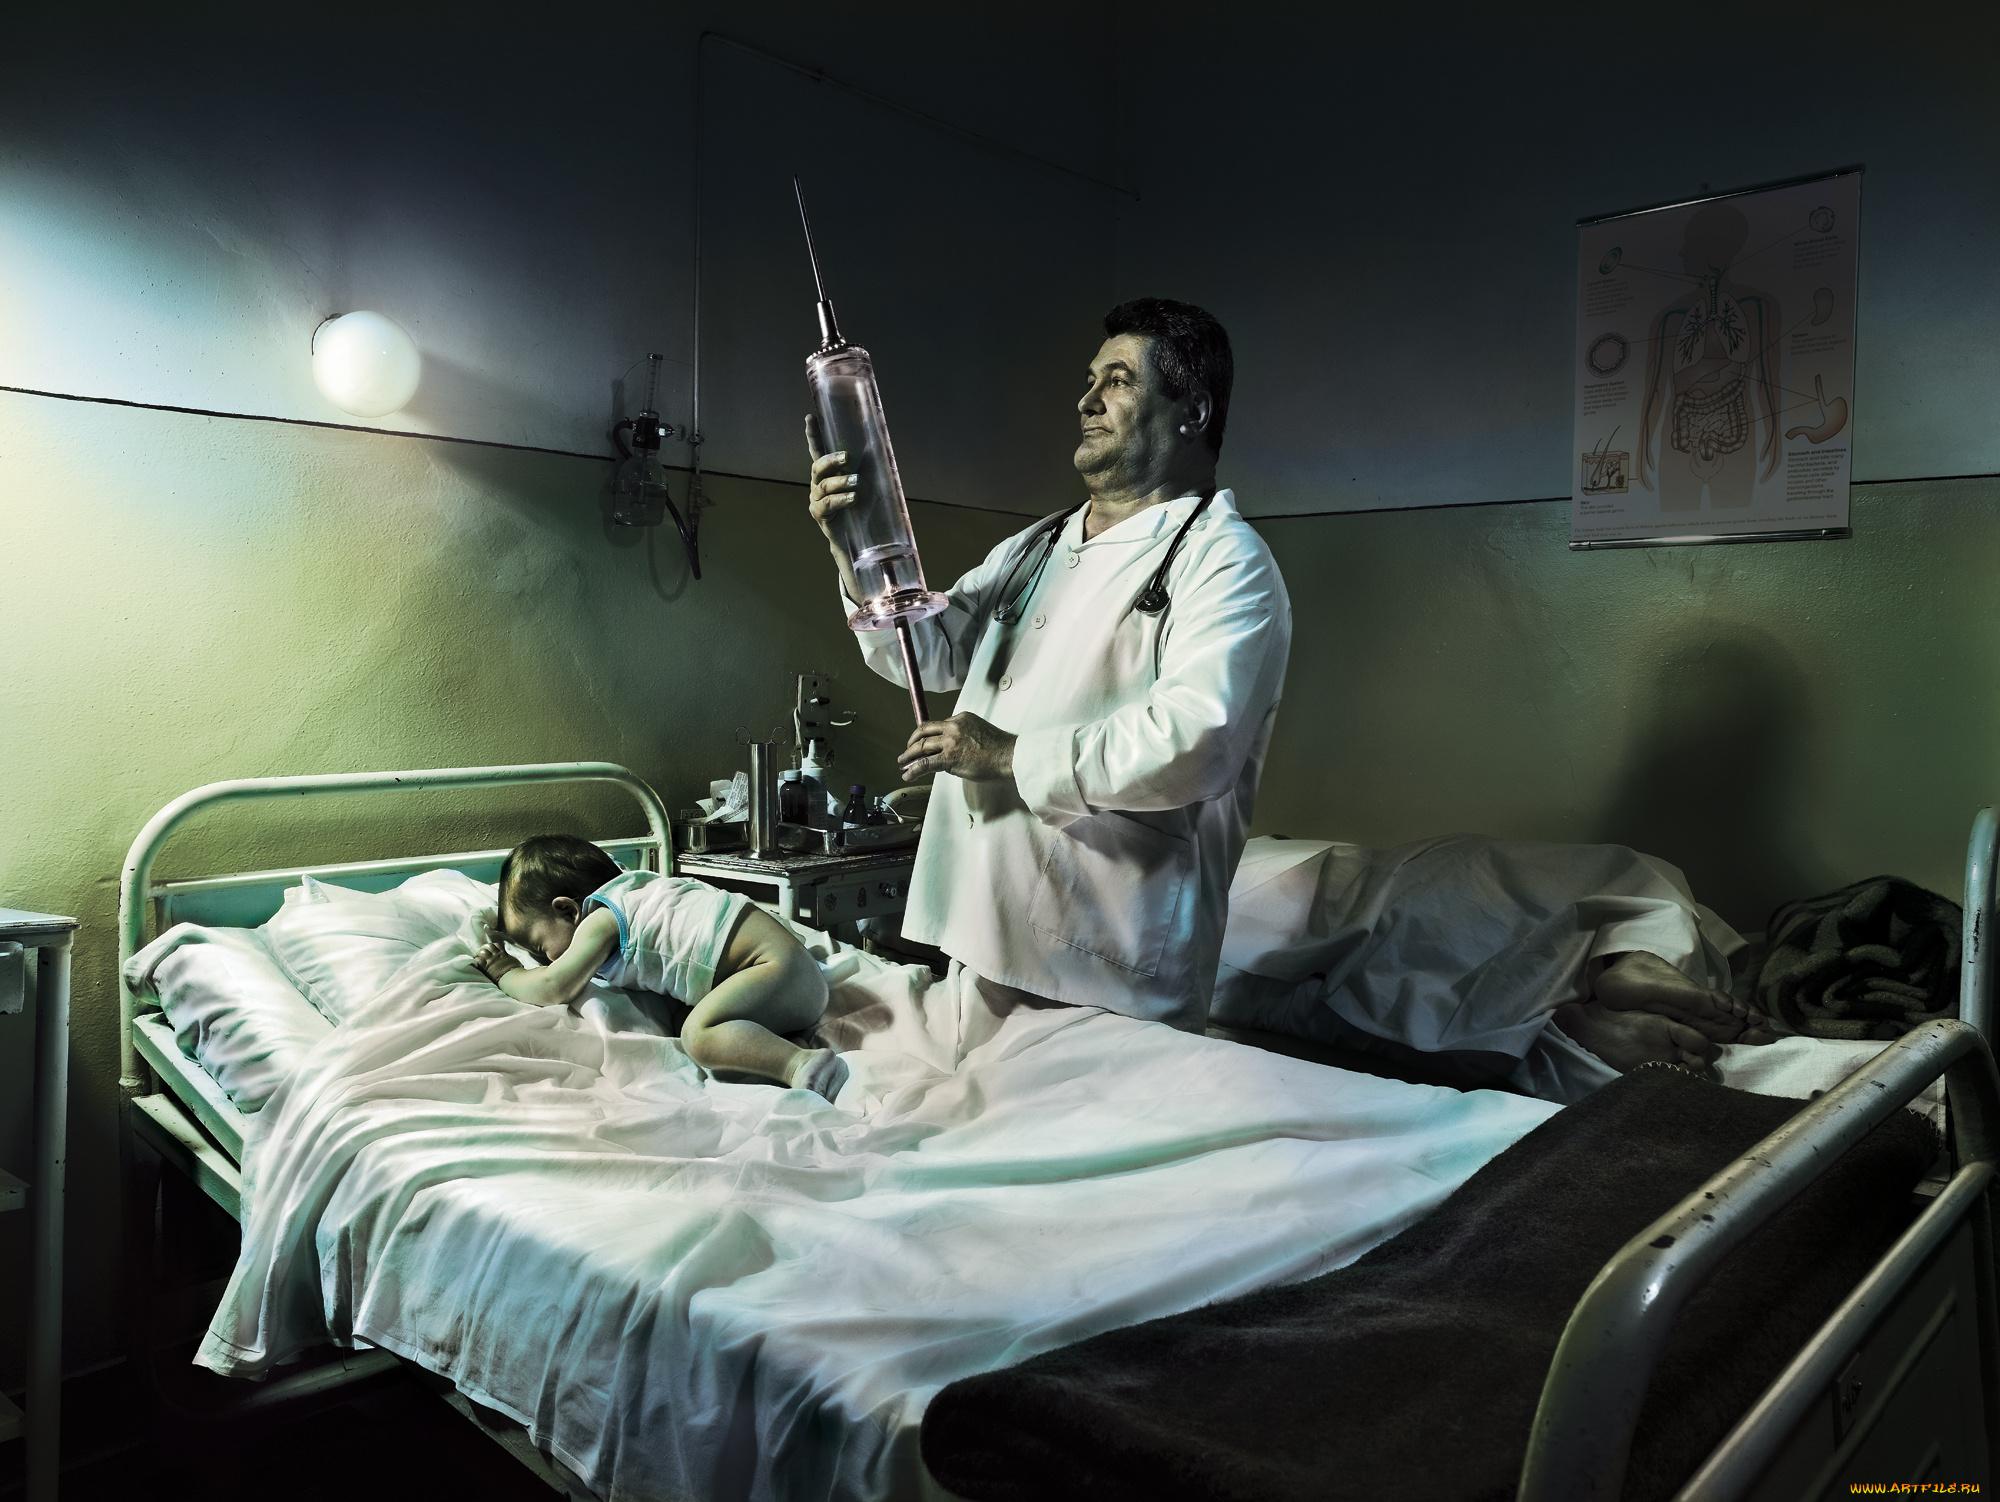 https://i.artfile.me/wallpaper/14-09-2012/2000x1502/yumor-prikoly-ukol-rebyonok-doktor-shpri-141352.jpg